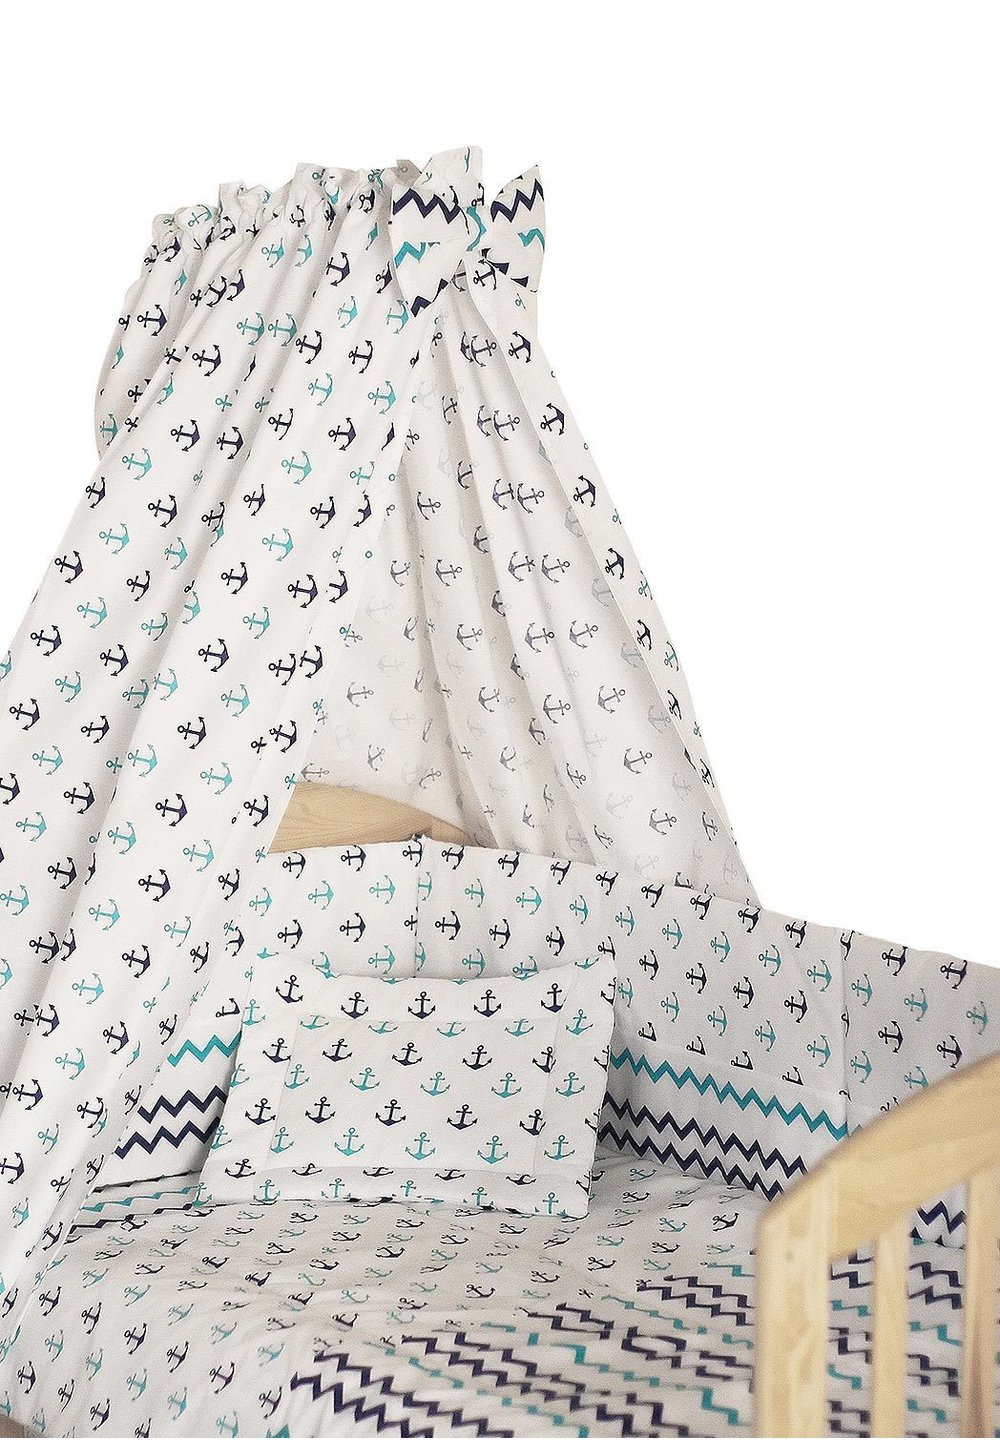 Lenjerie cu baldachin, 6 piese, ancore, 120x60 cm